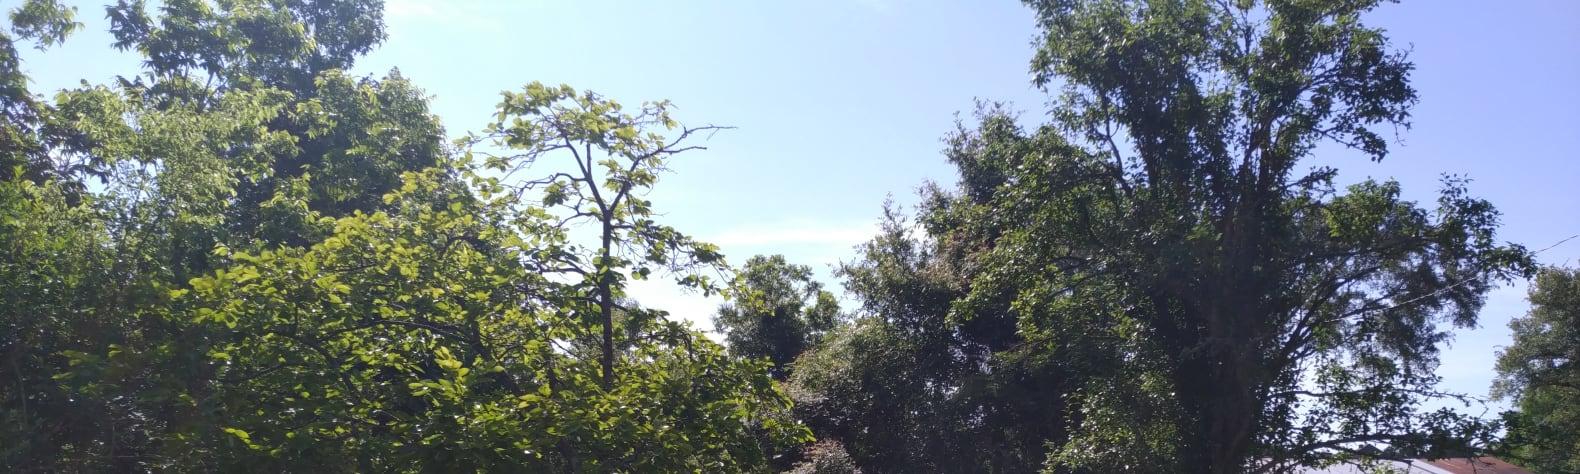 Tot and NUNU's land